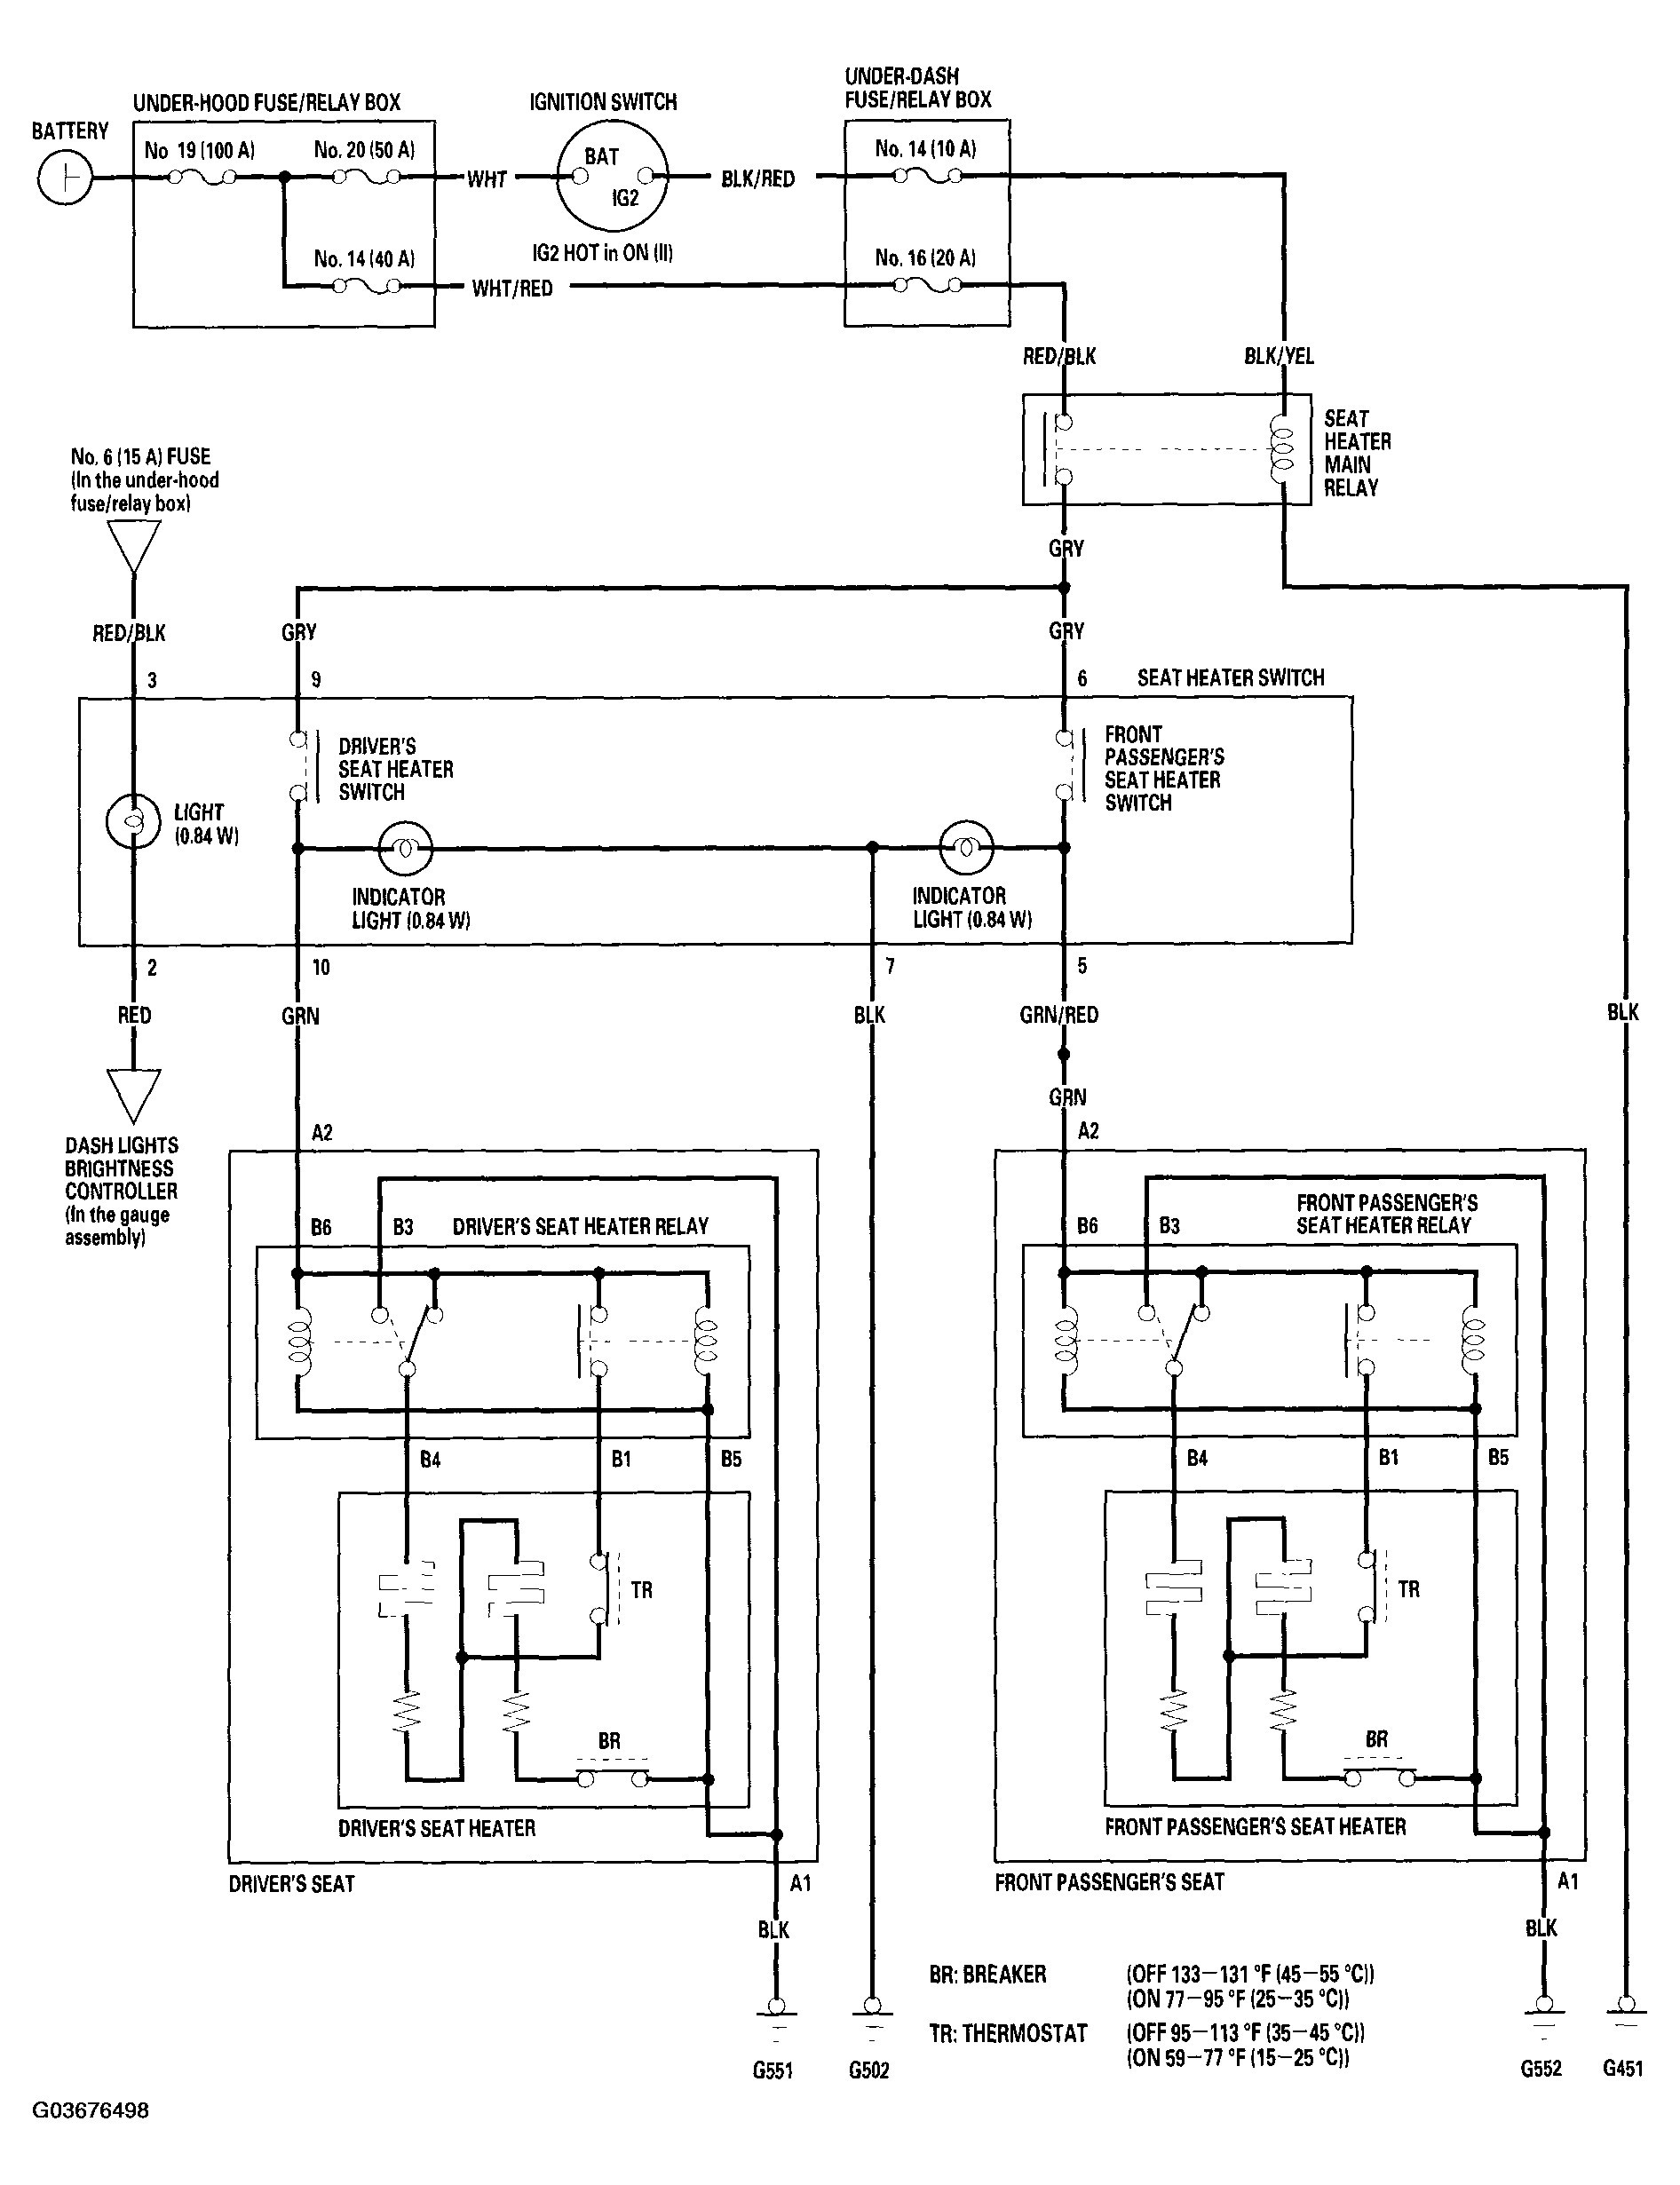 1995 Honda Accord Engine Diagram | Wiring Liry on